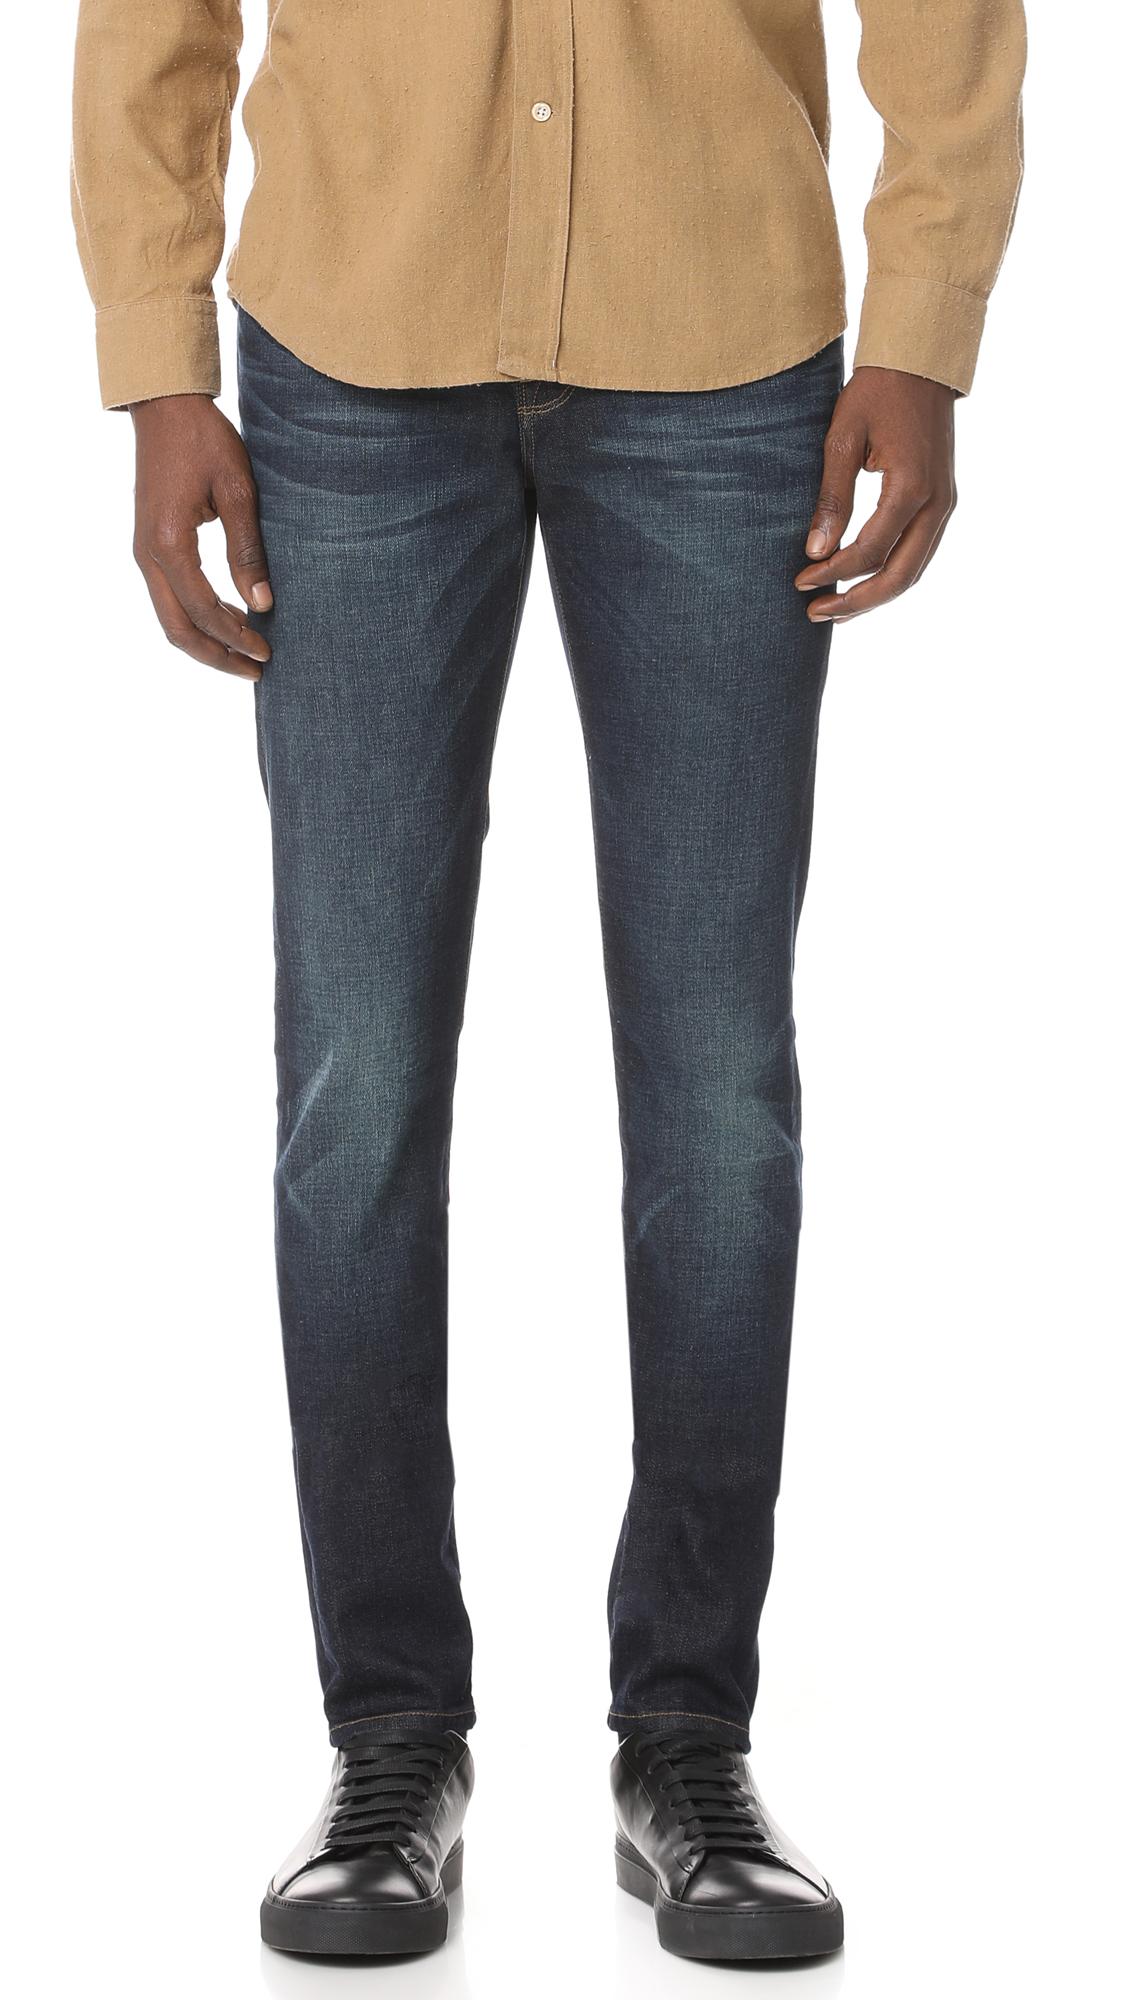 L'Homme Skinny Denim Jeans